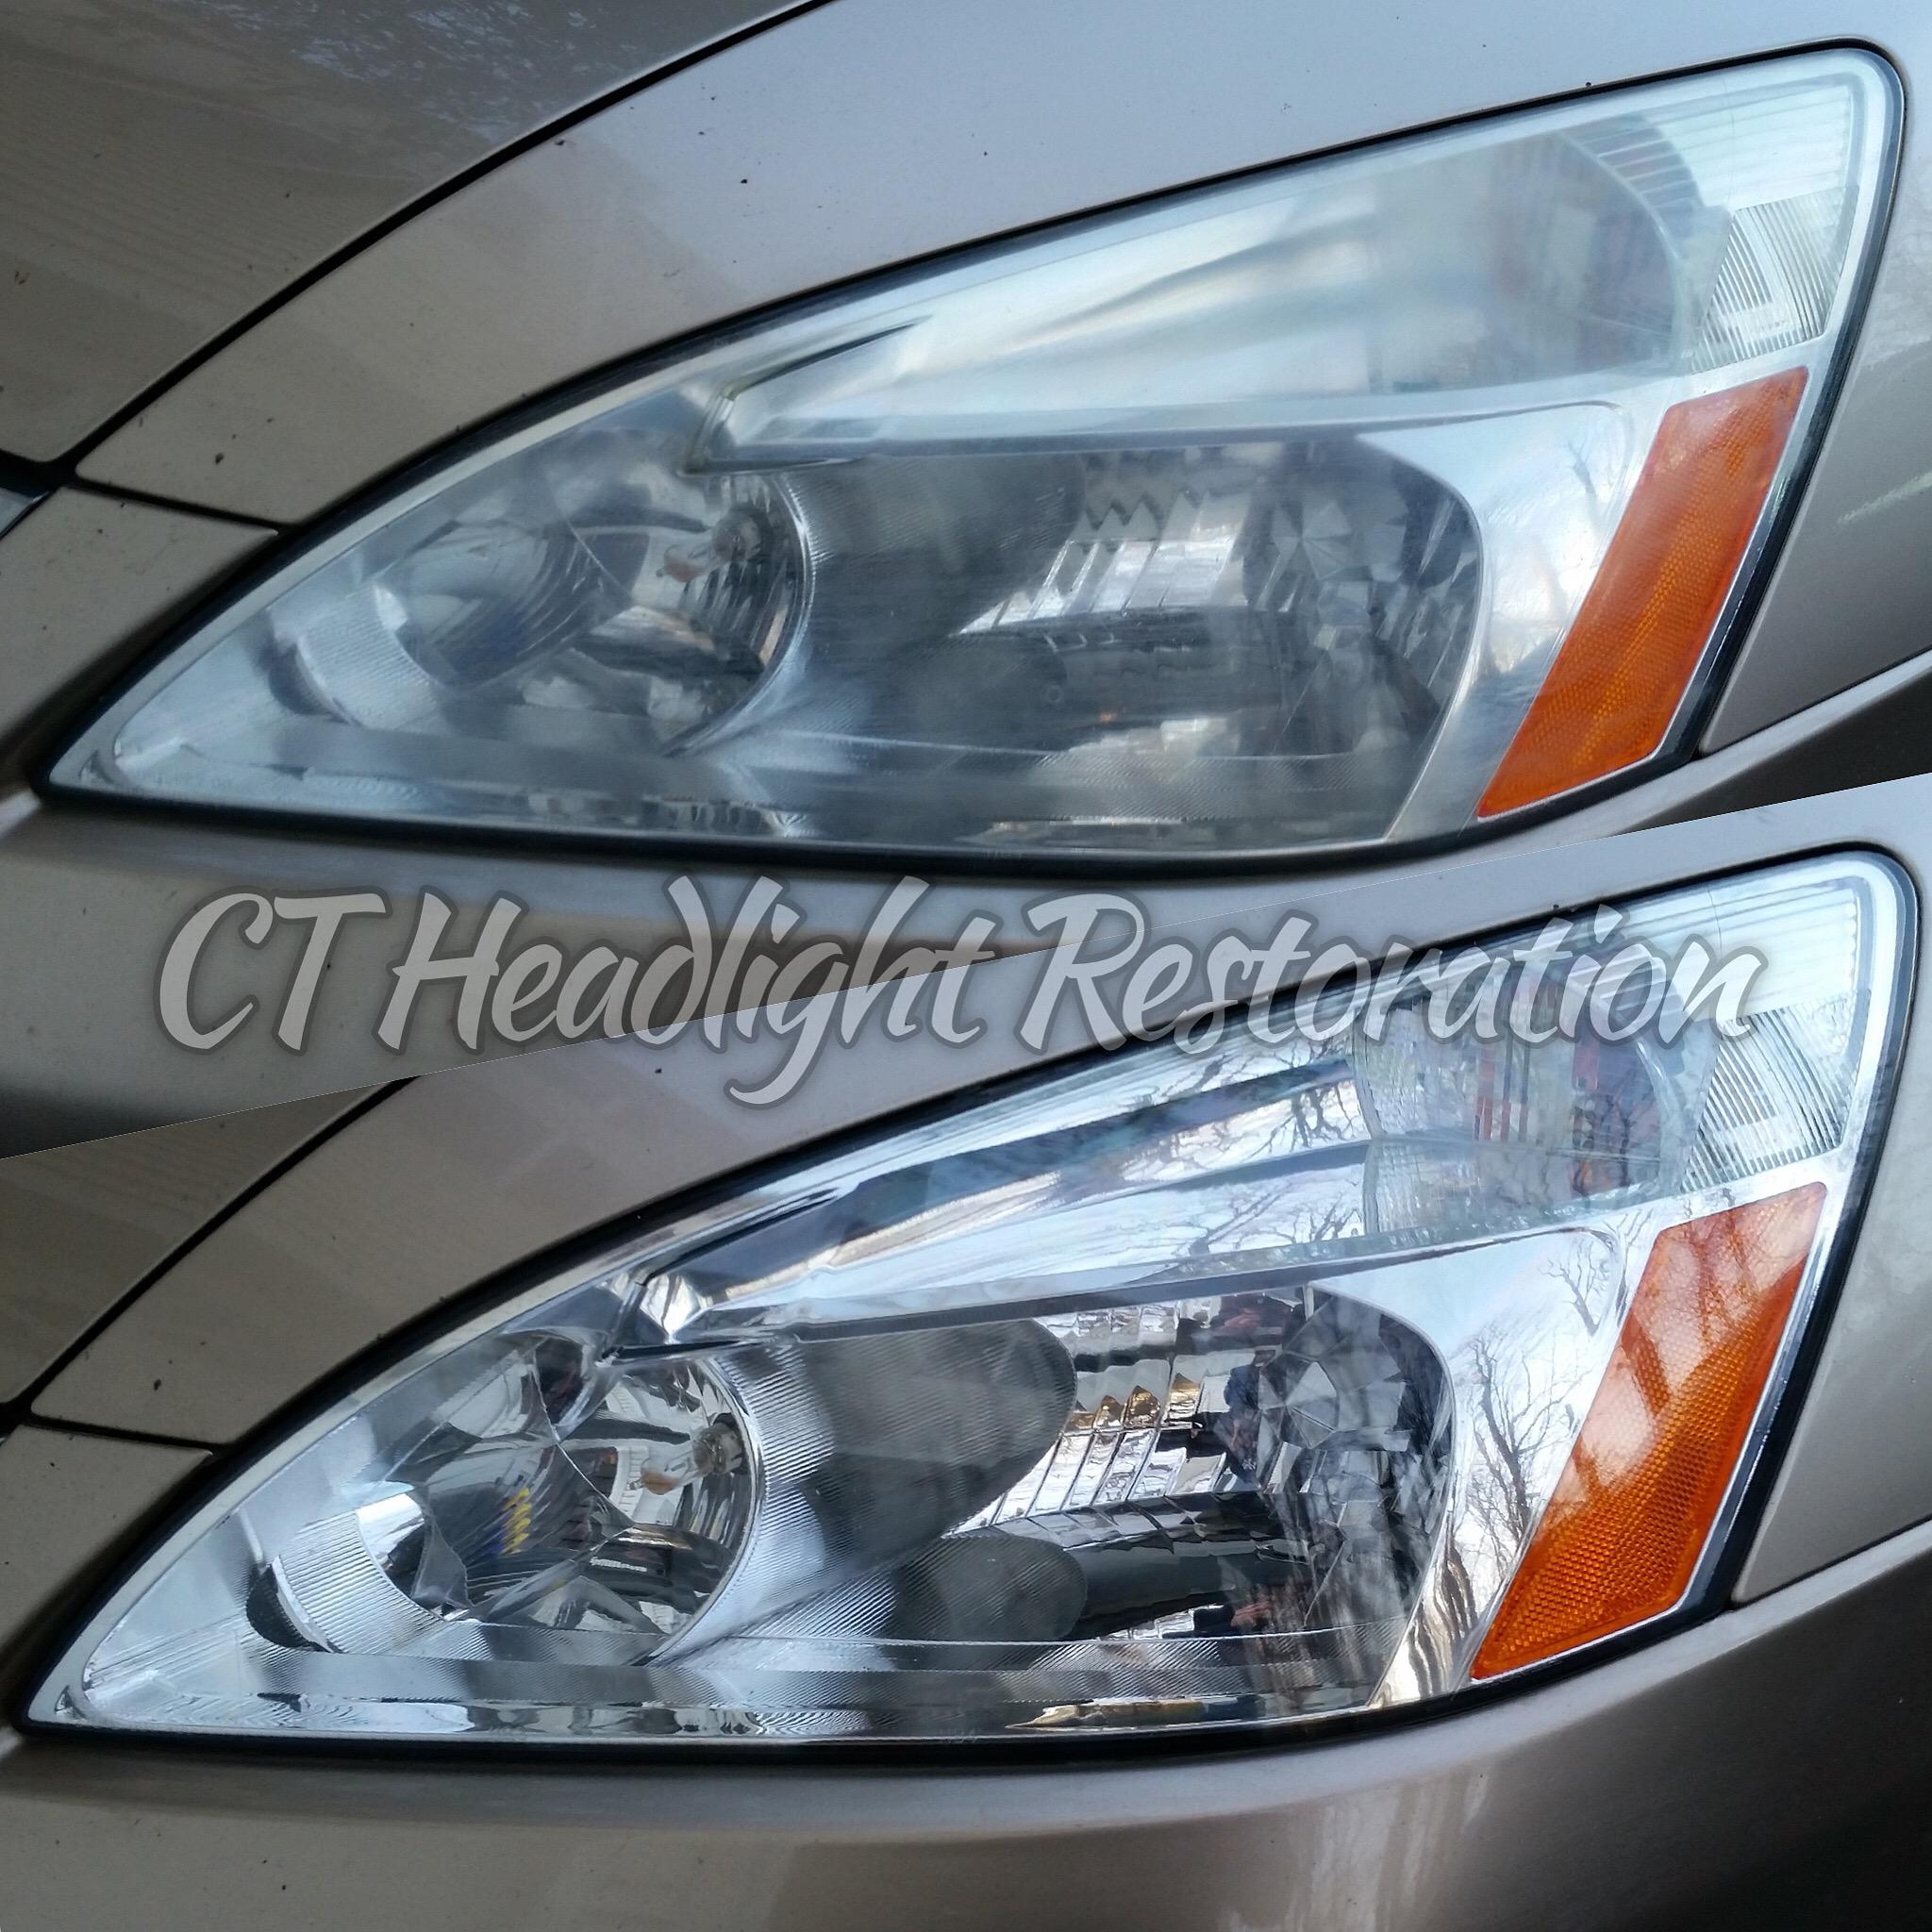 Connecticut Headlight Restoration Honda Accord.JPG